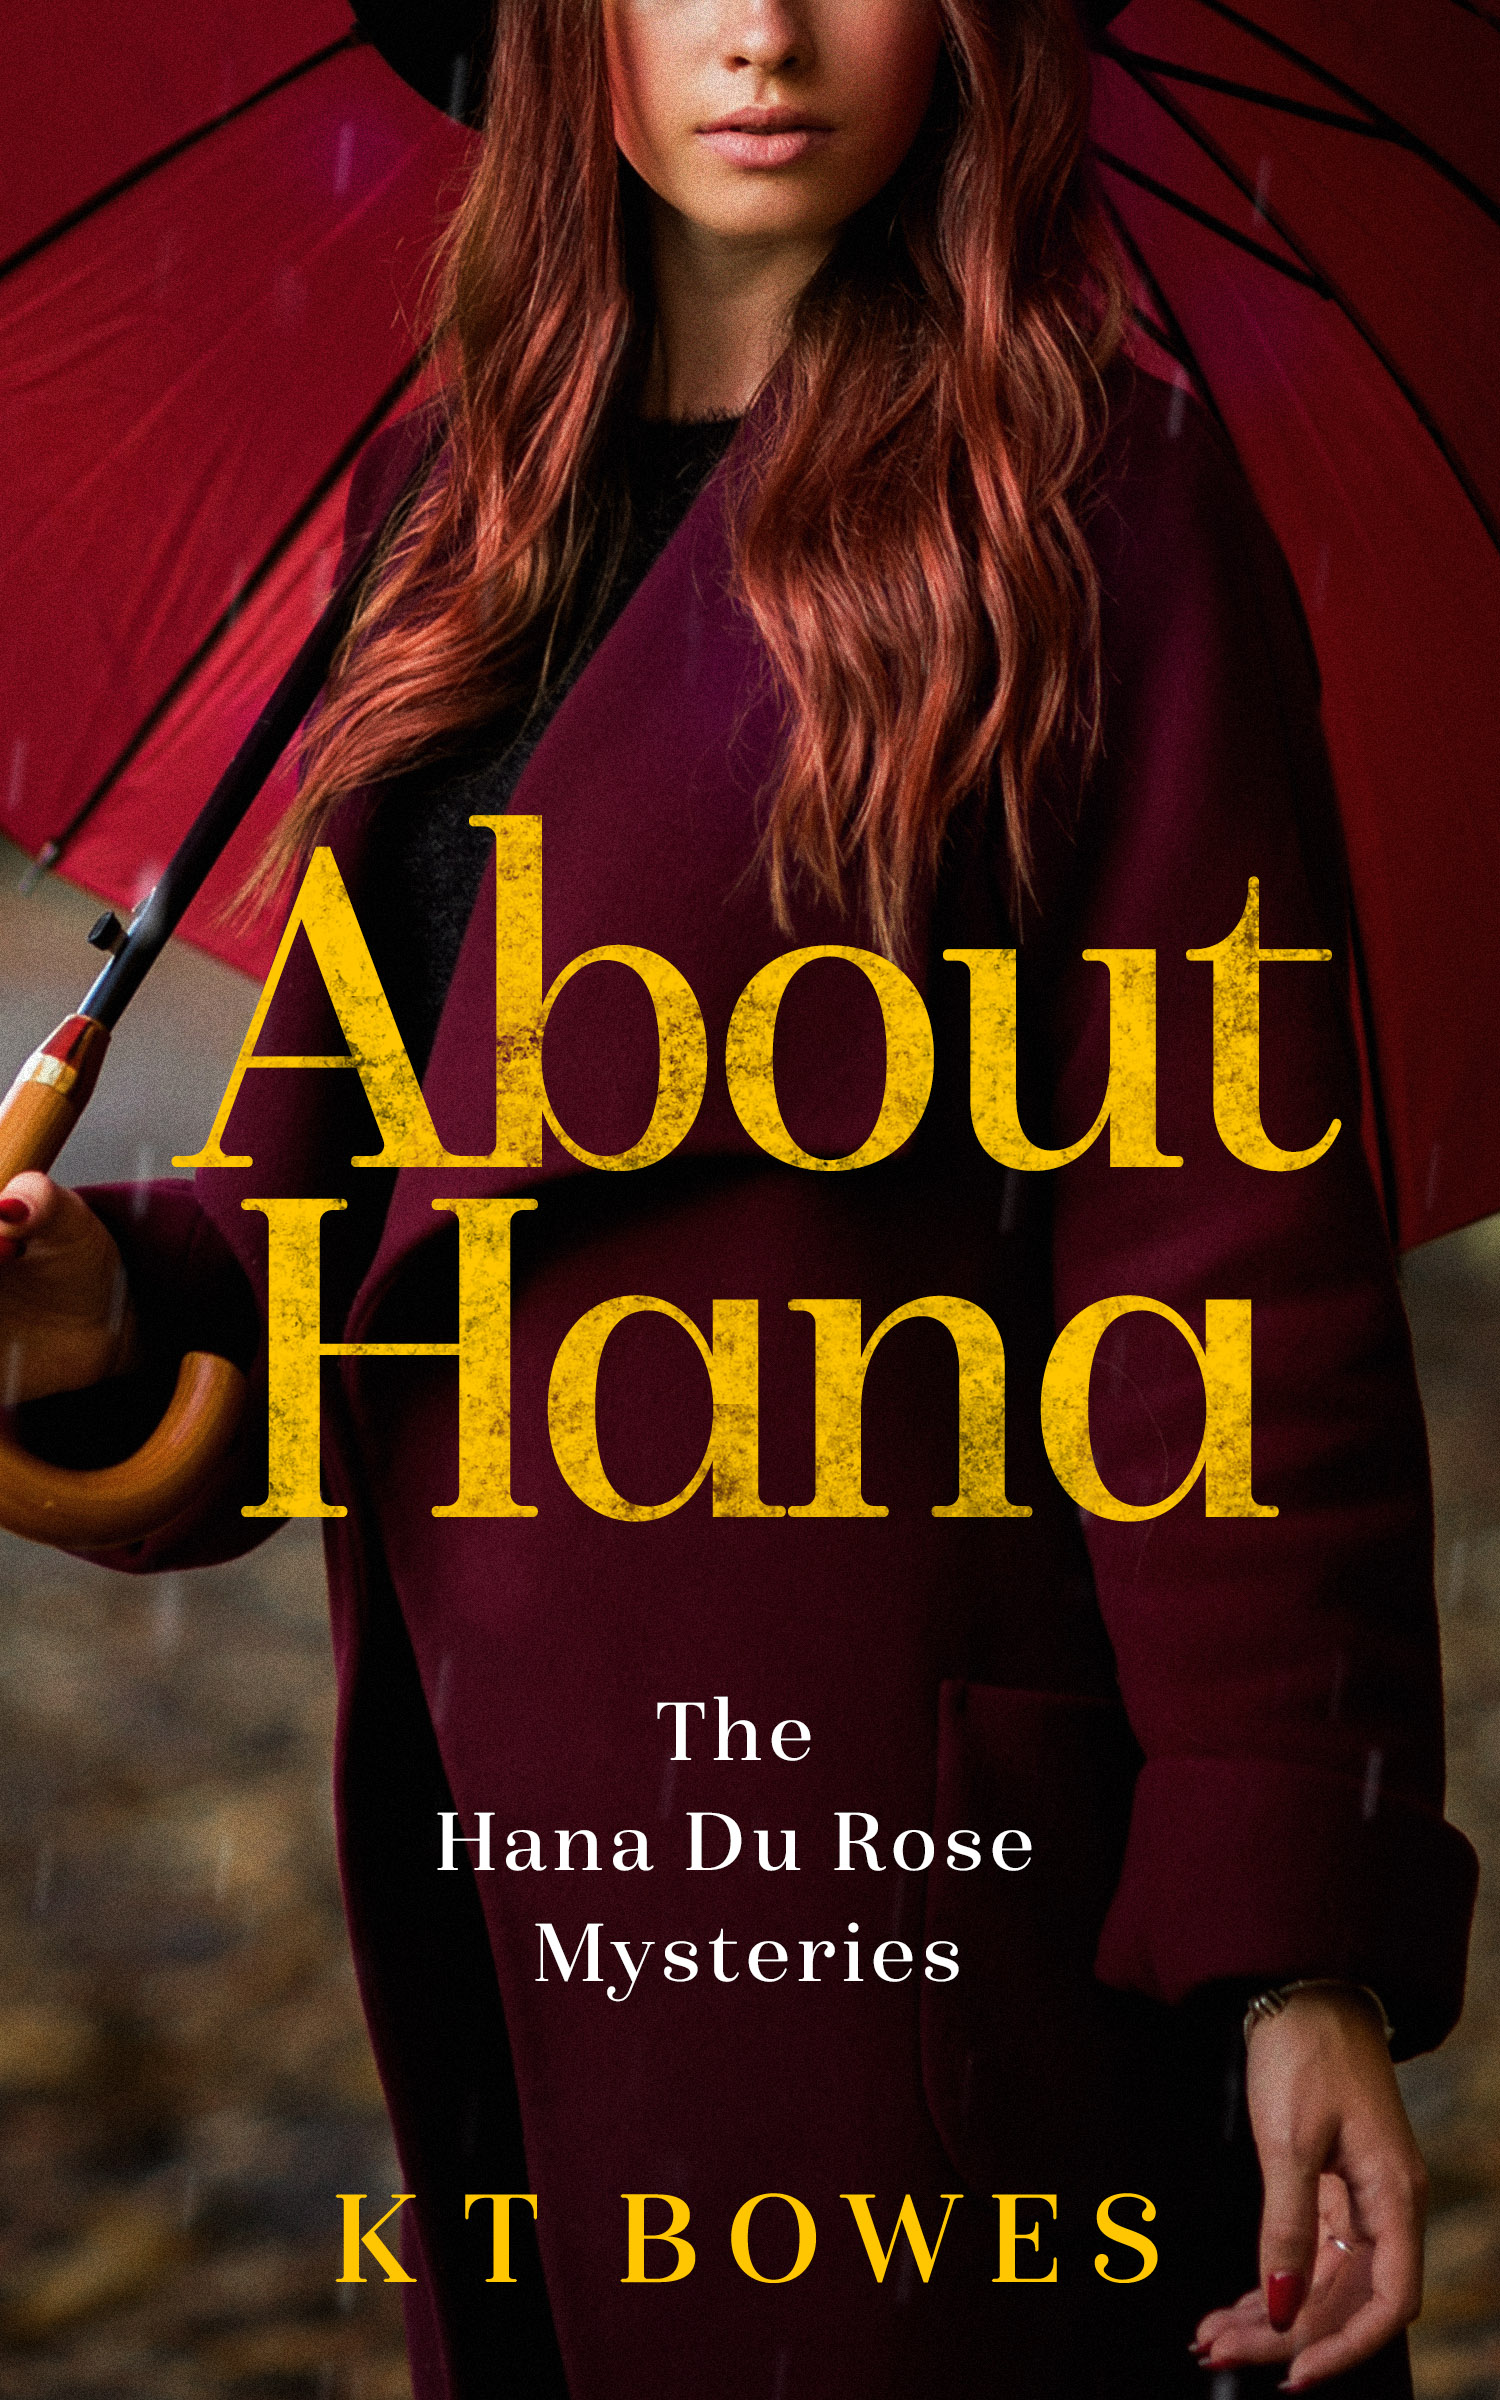 About Hana (sst-ccclxxxvii)